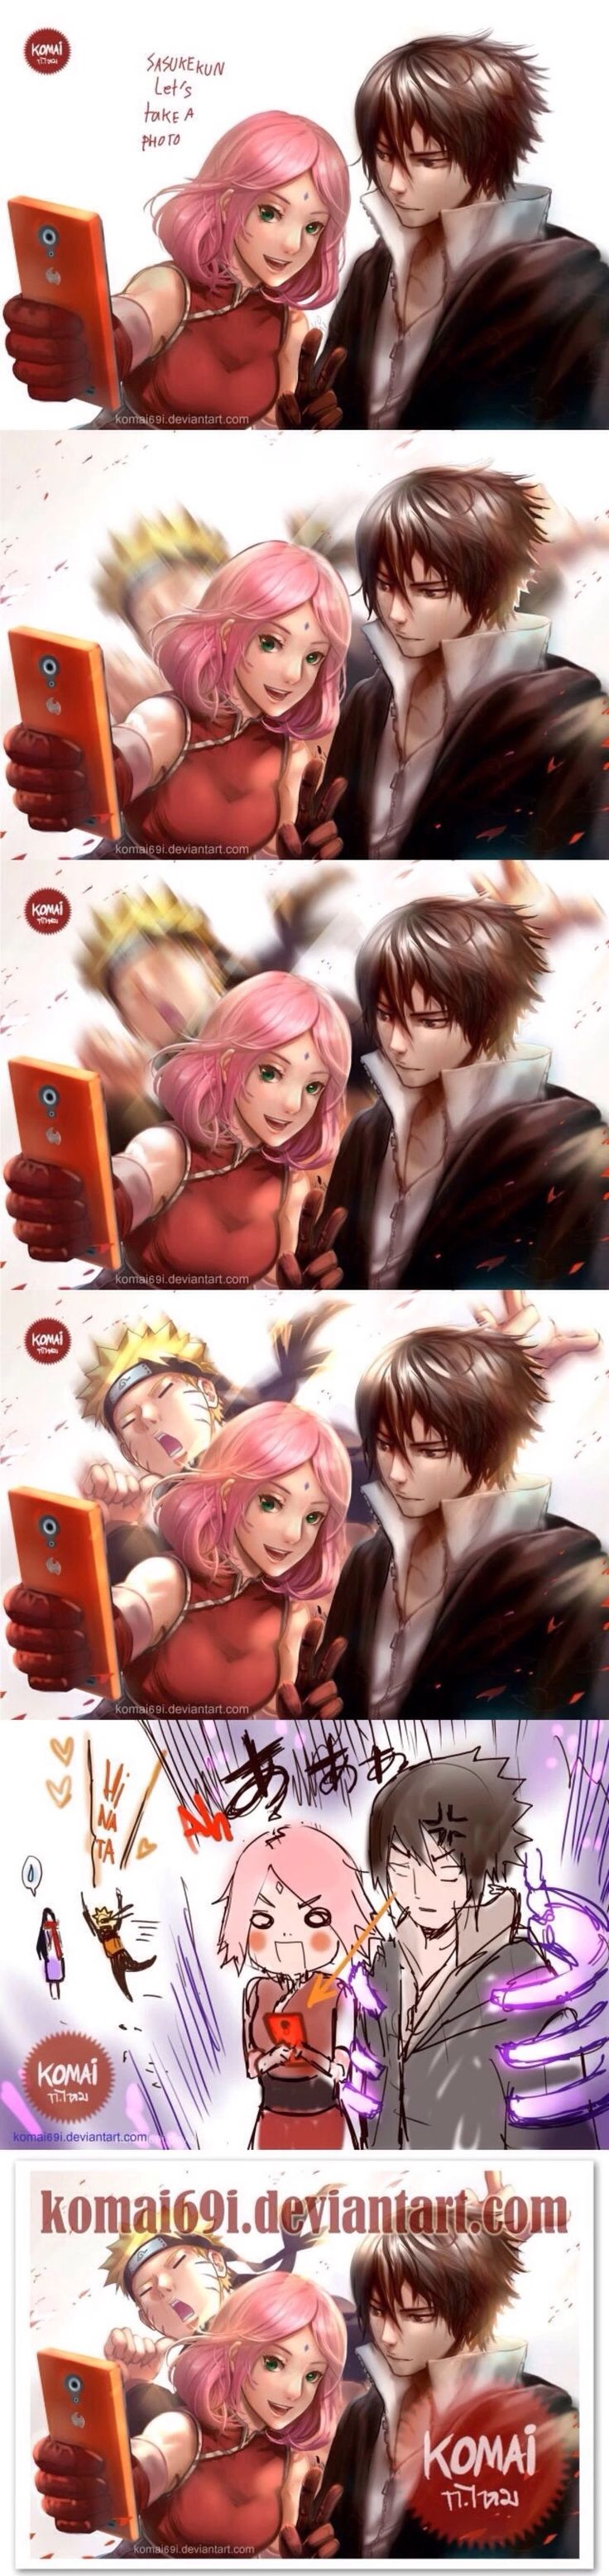 best naruto images on pinterest anime naruto boruto and naruhina